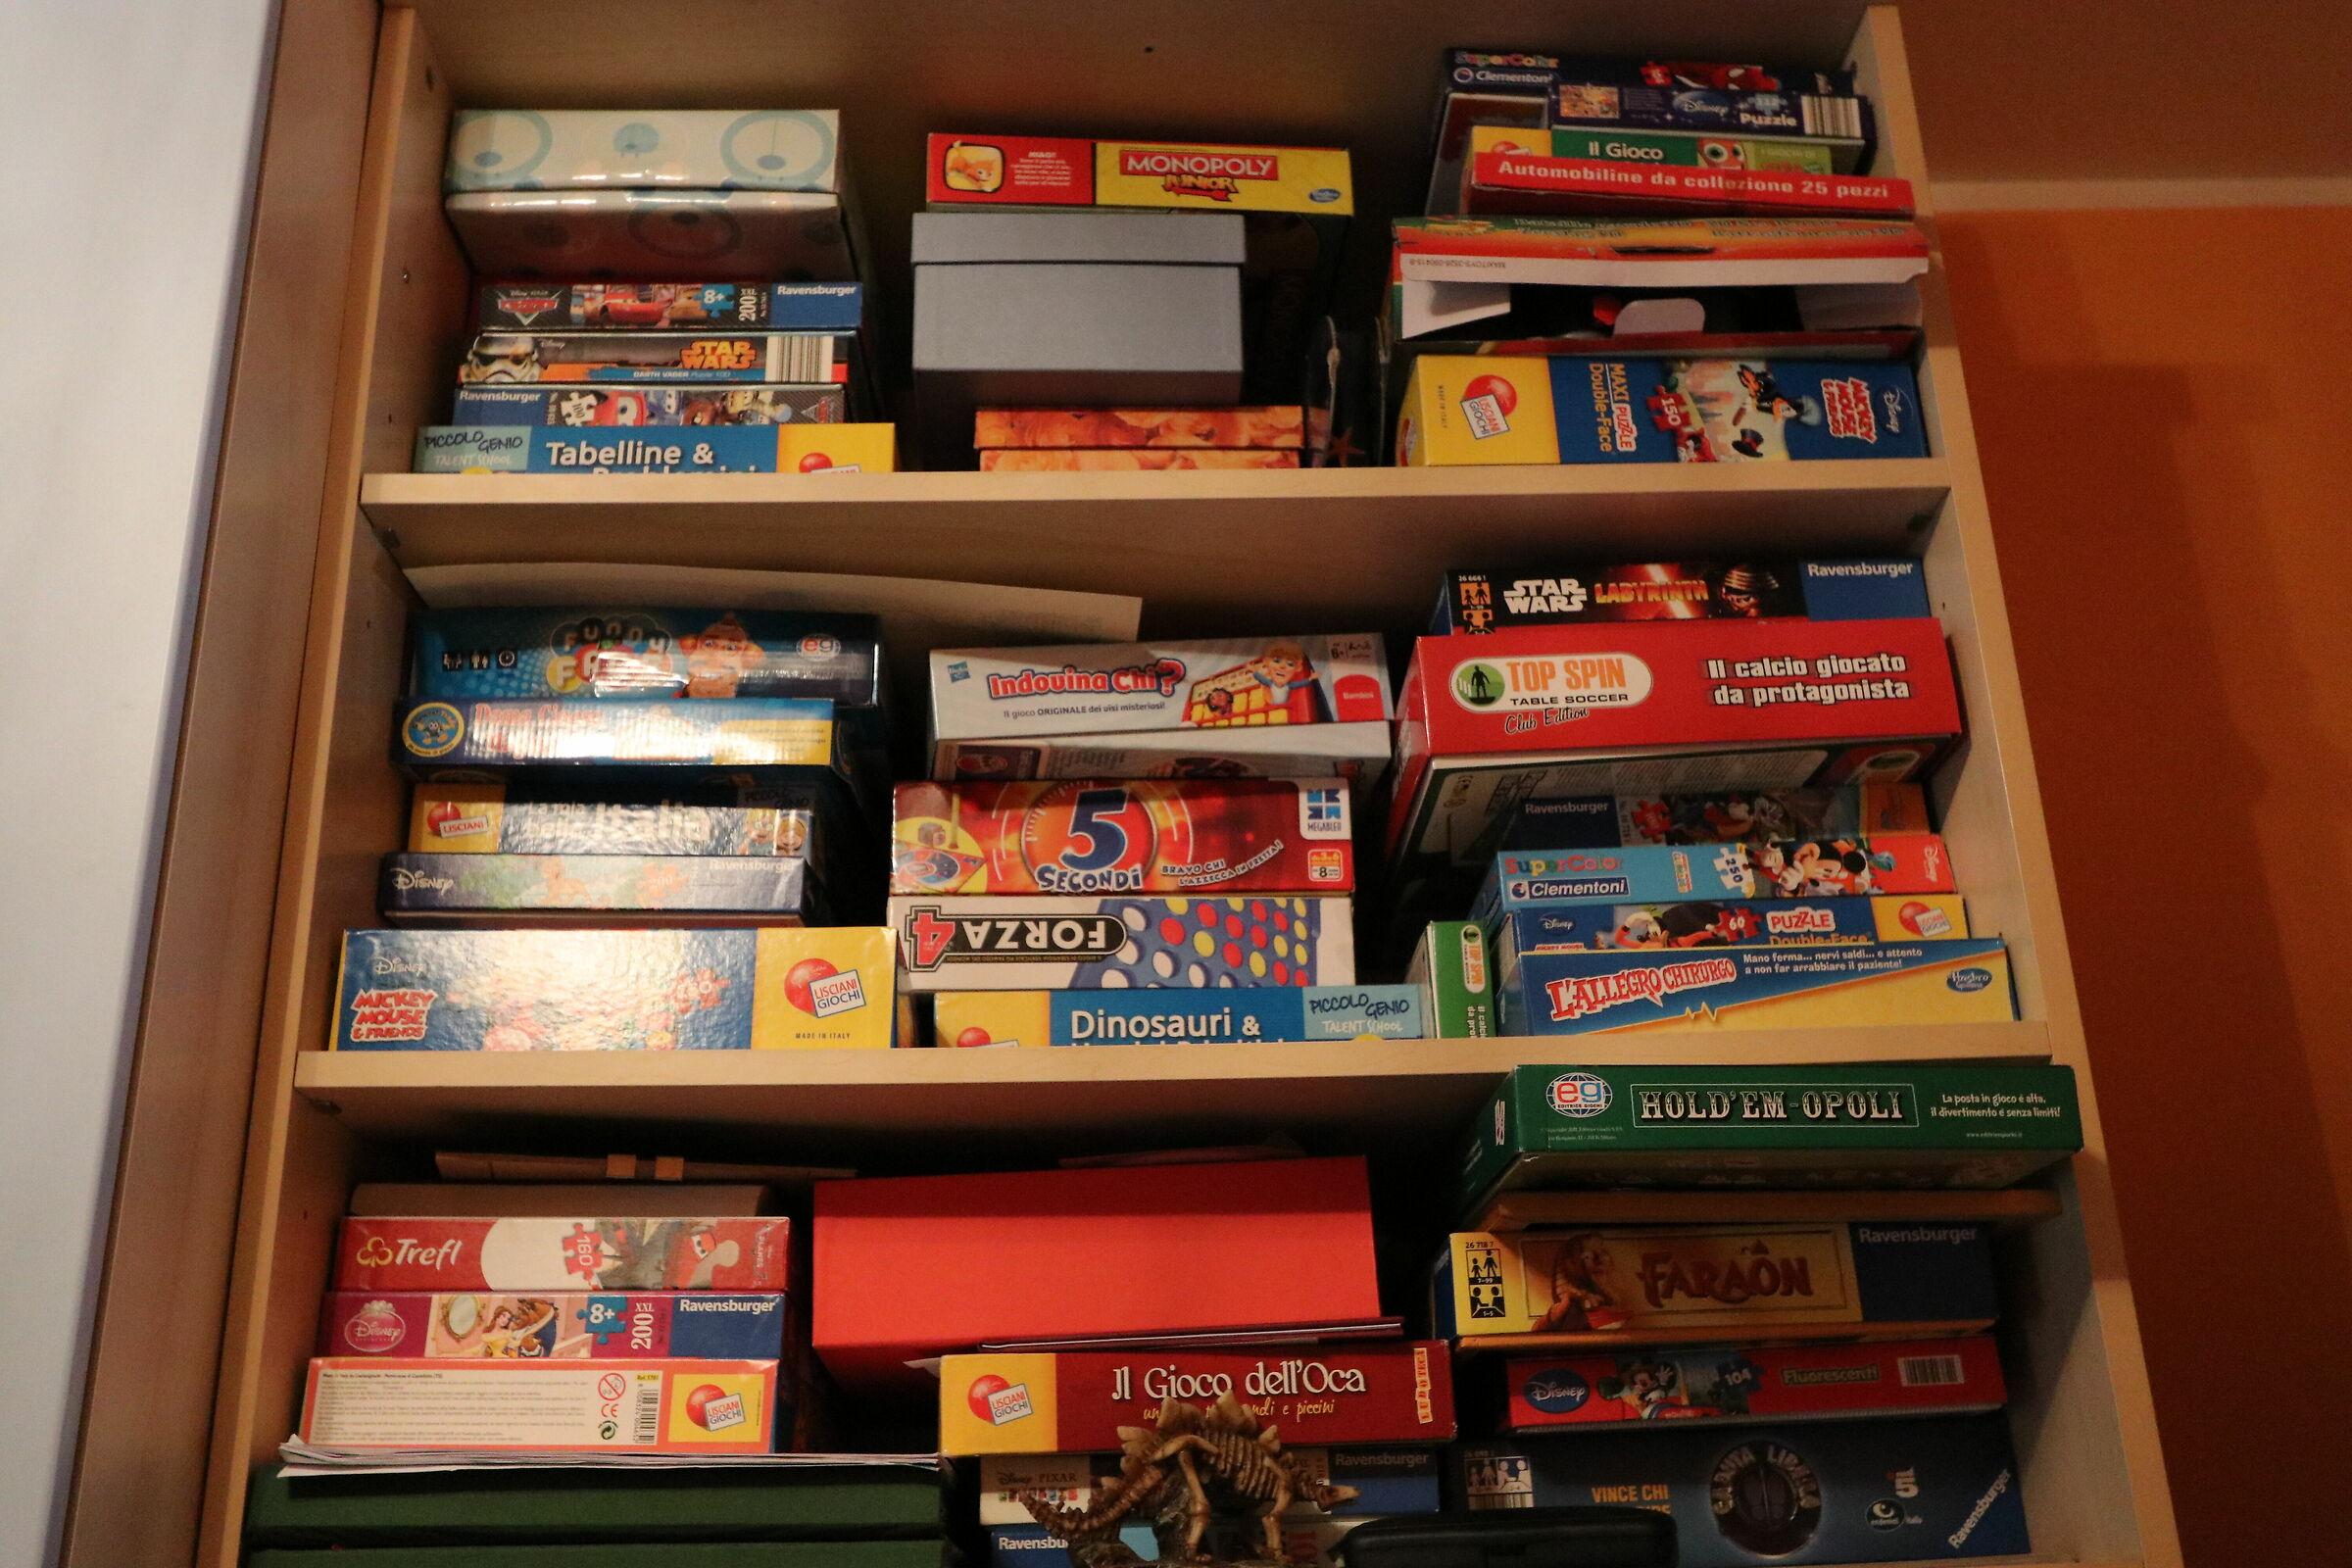 Forgotten games...